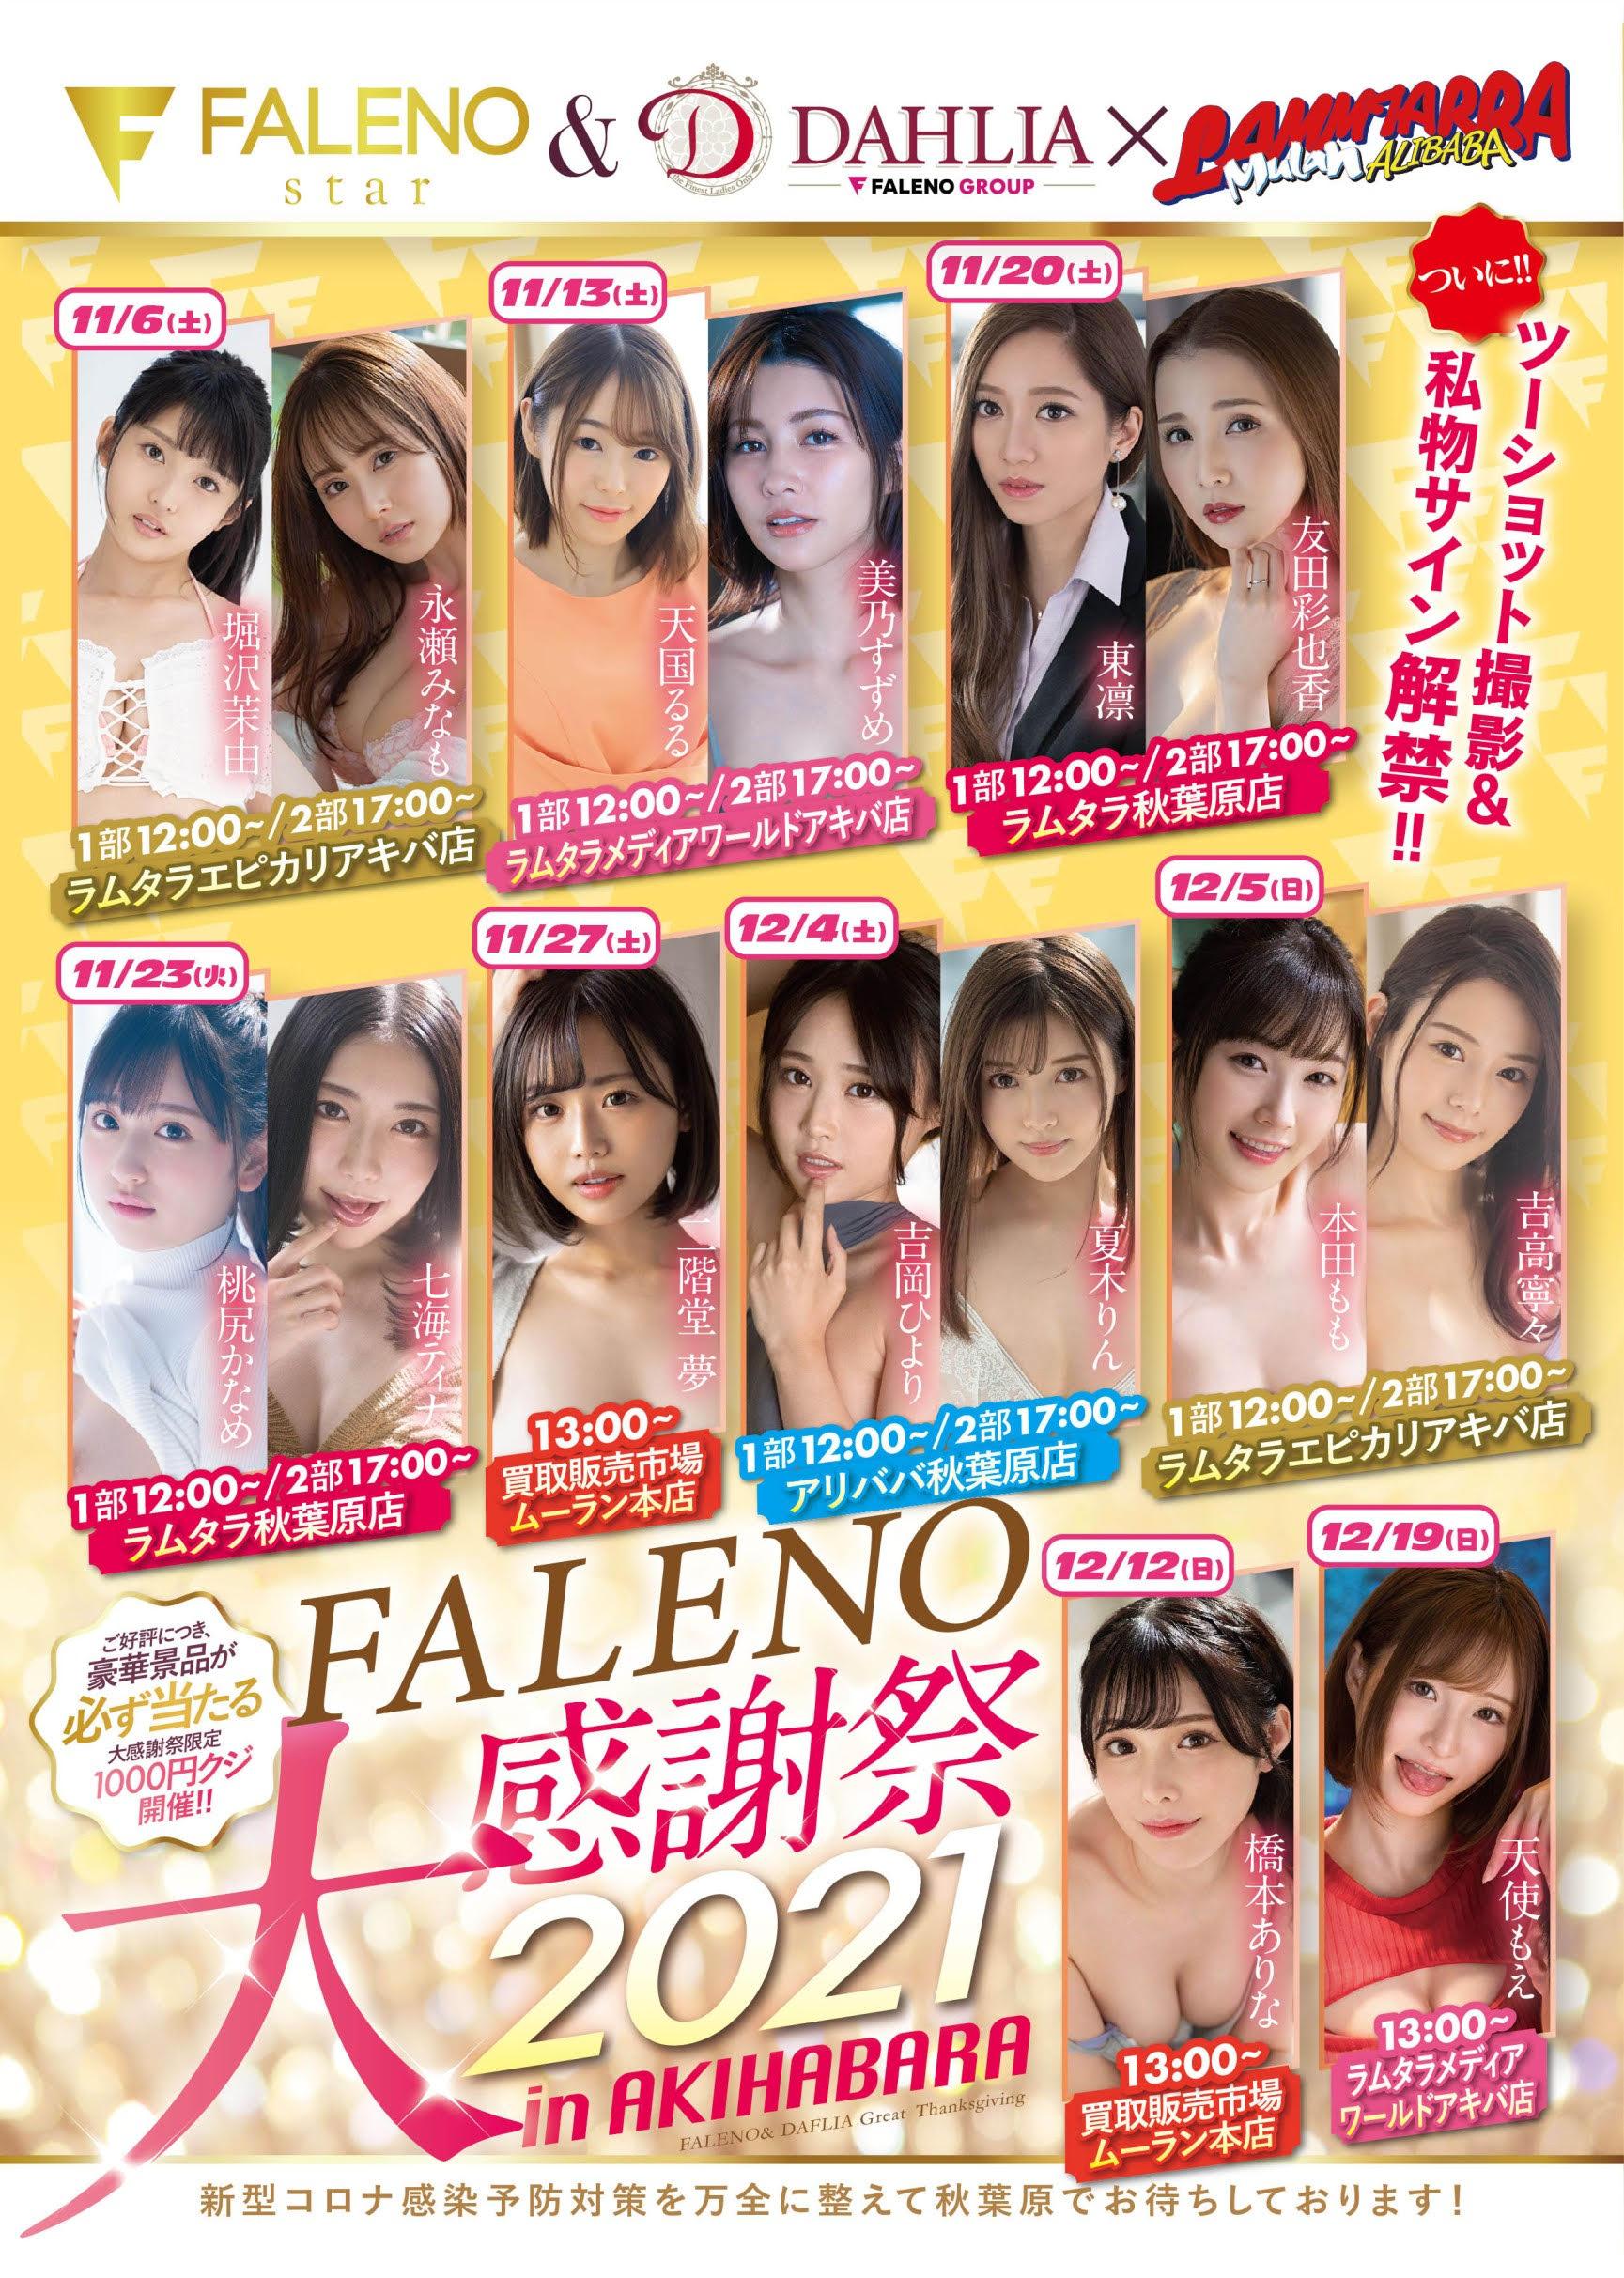 【FALENO】大感謝祭2021 堀沢茉由×永瀬みなも in ラムタラ エピカリ アキバ店画像